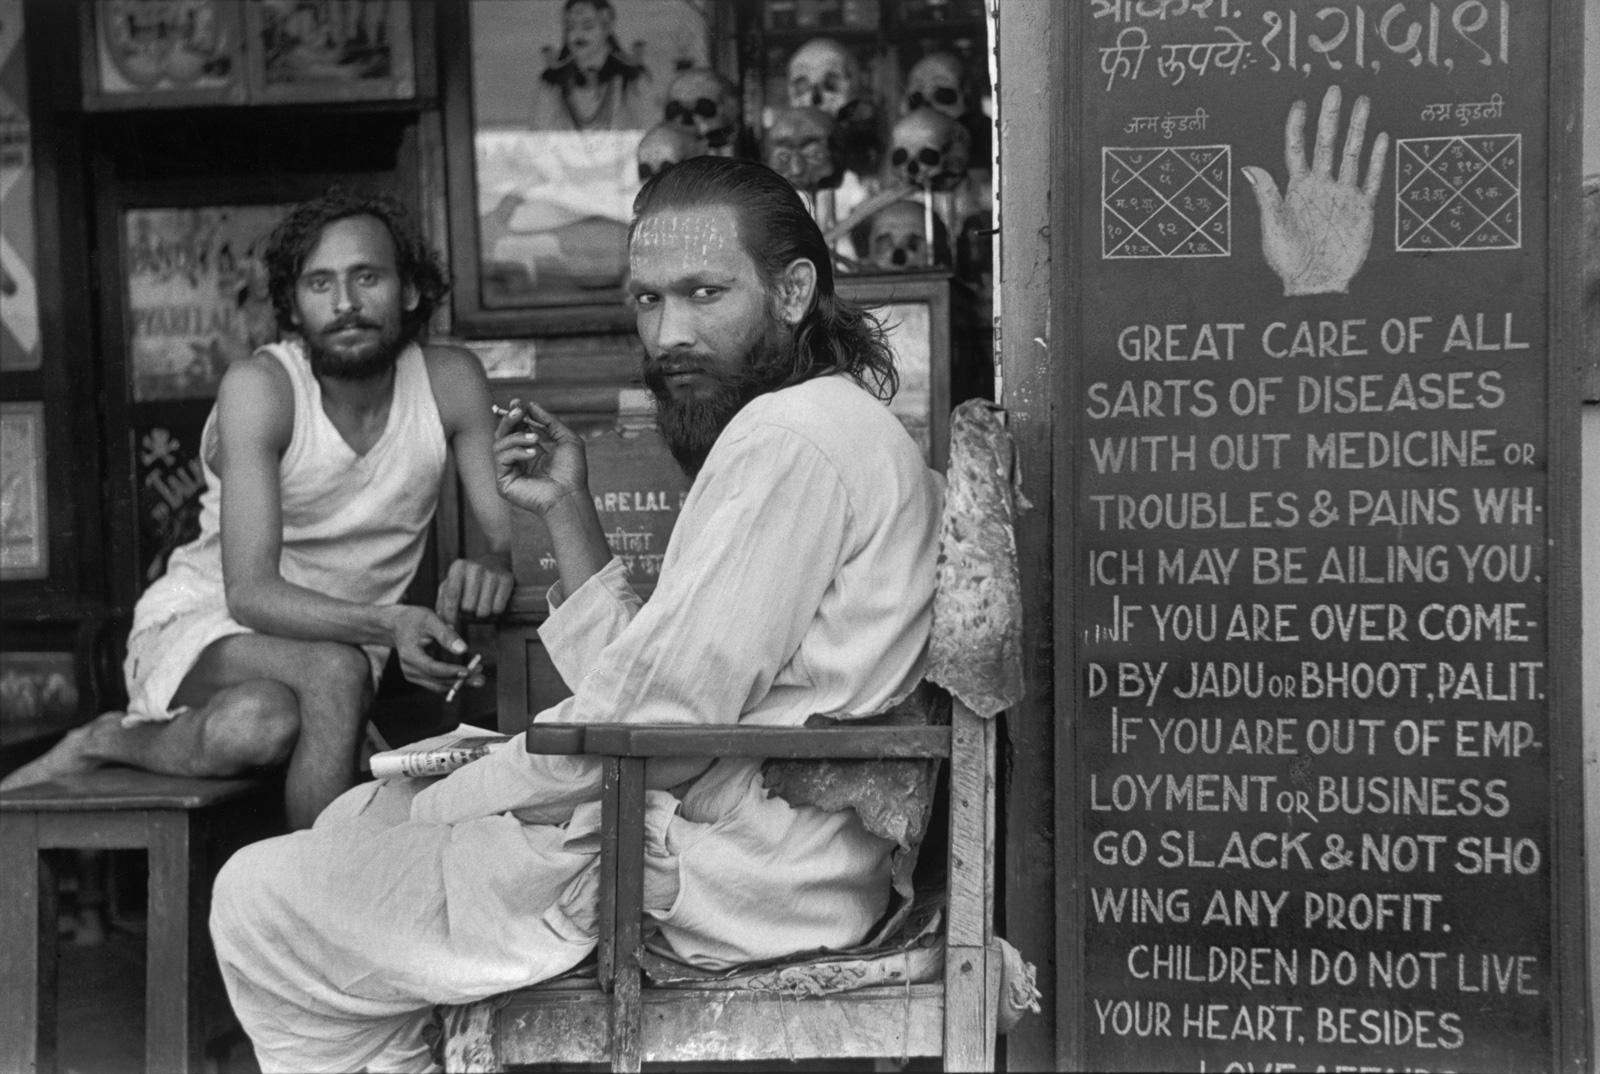 cartier-bresson-astrologers